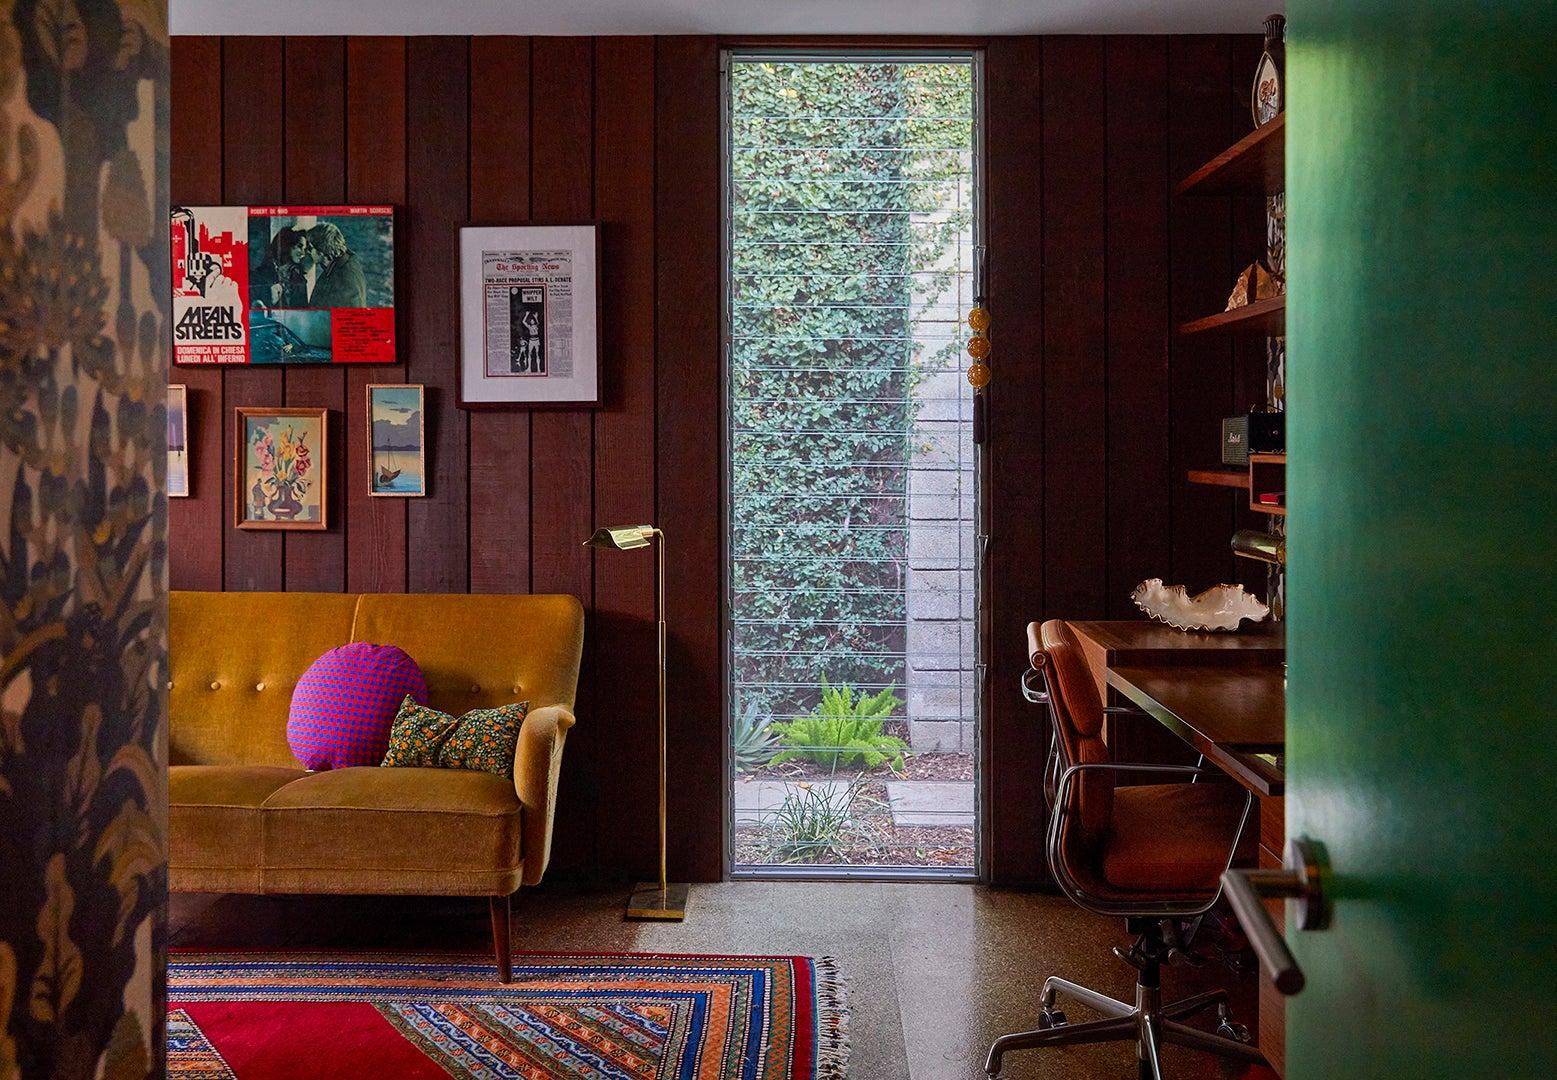 wood paneled room with yellow sofa